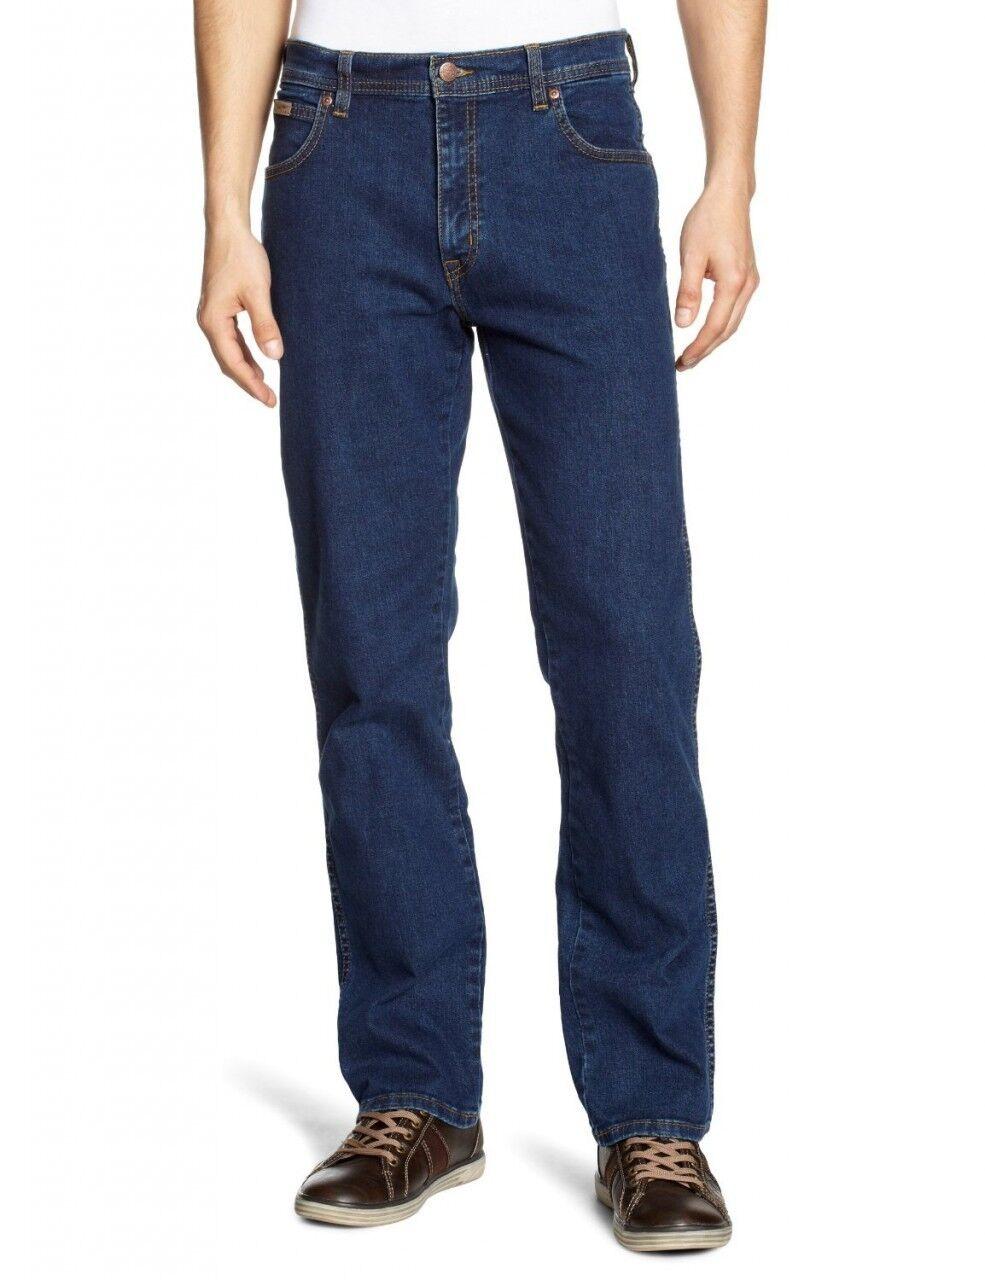 Wrangler Texas Stretch Regular Fit Denim Jeans New Men's Blau Darkstone